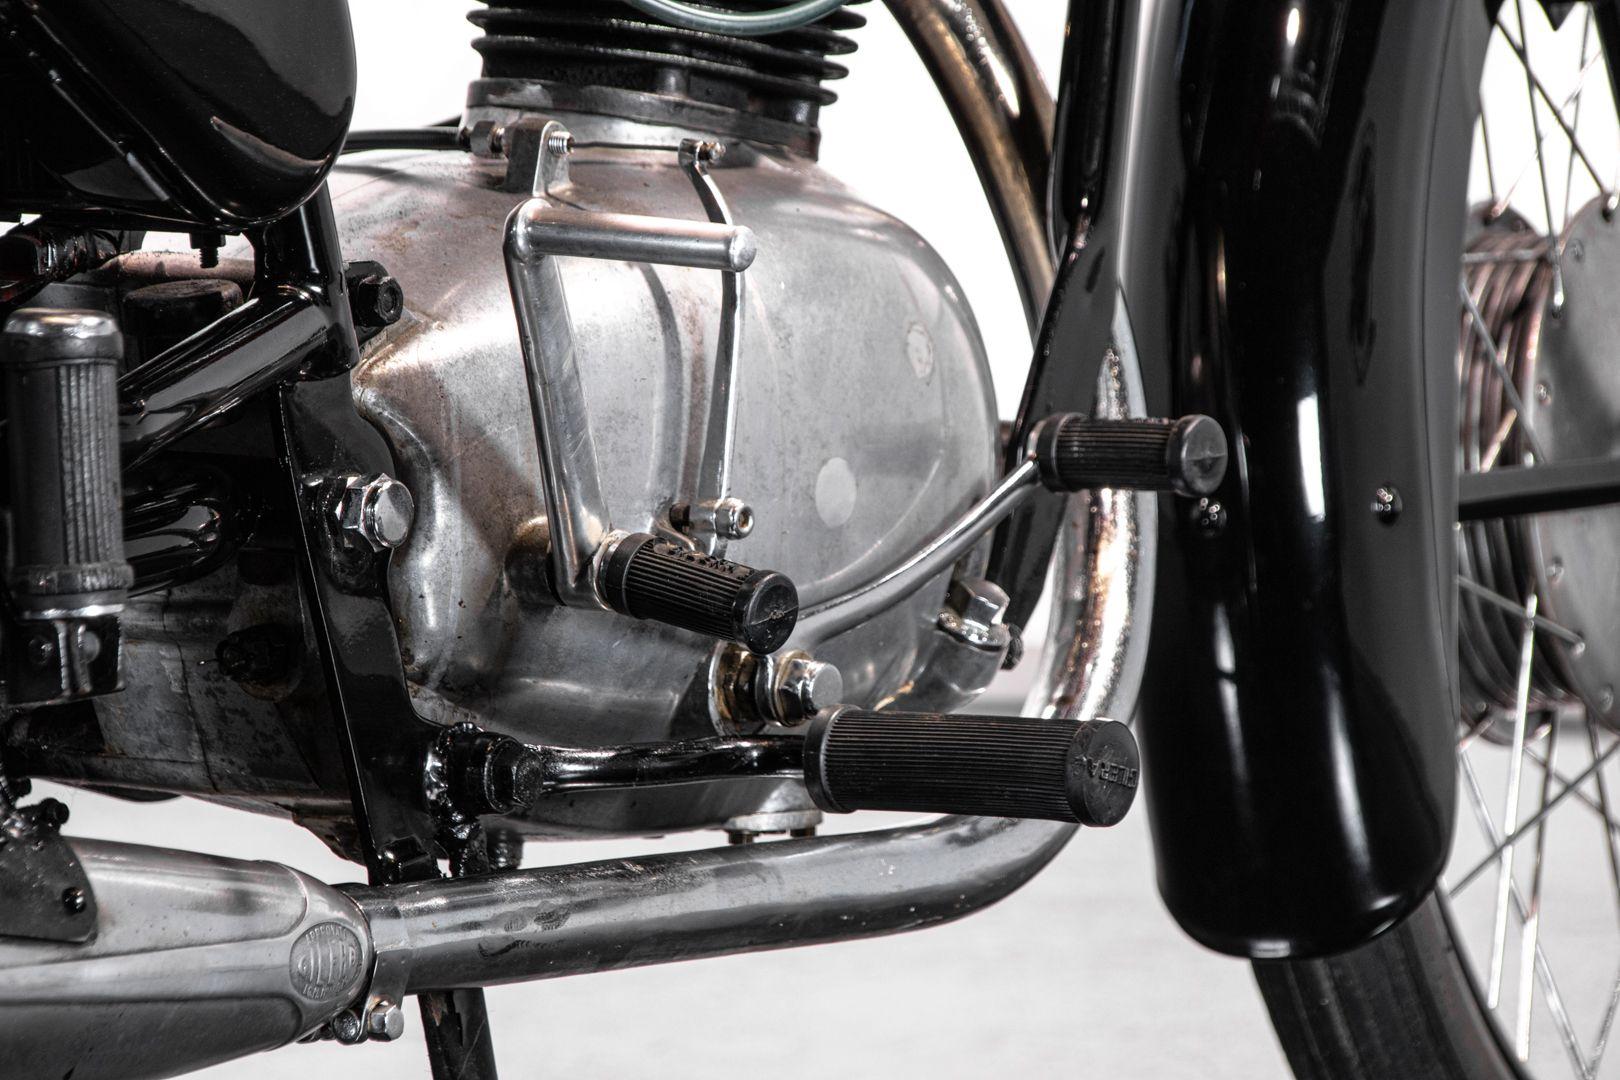 1960 Gilera 150 64020